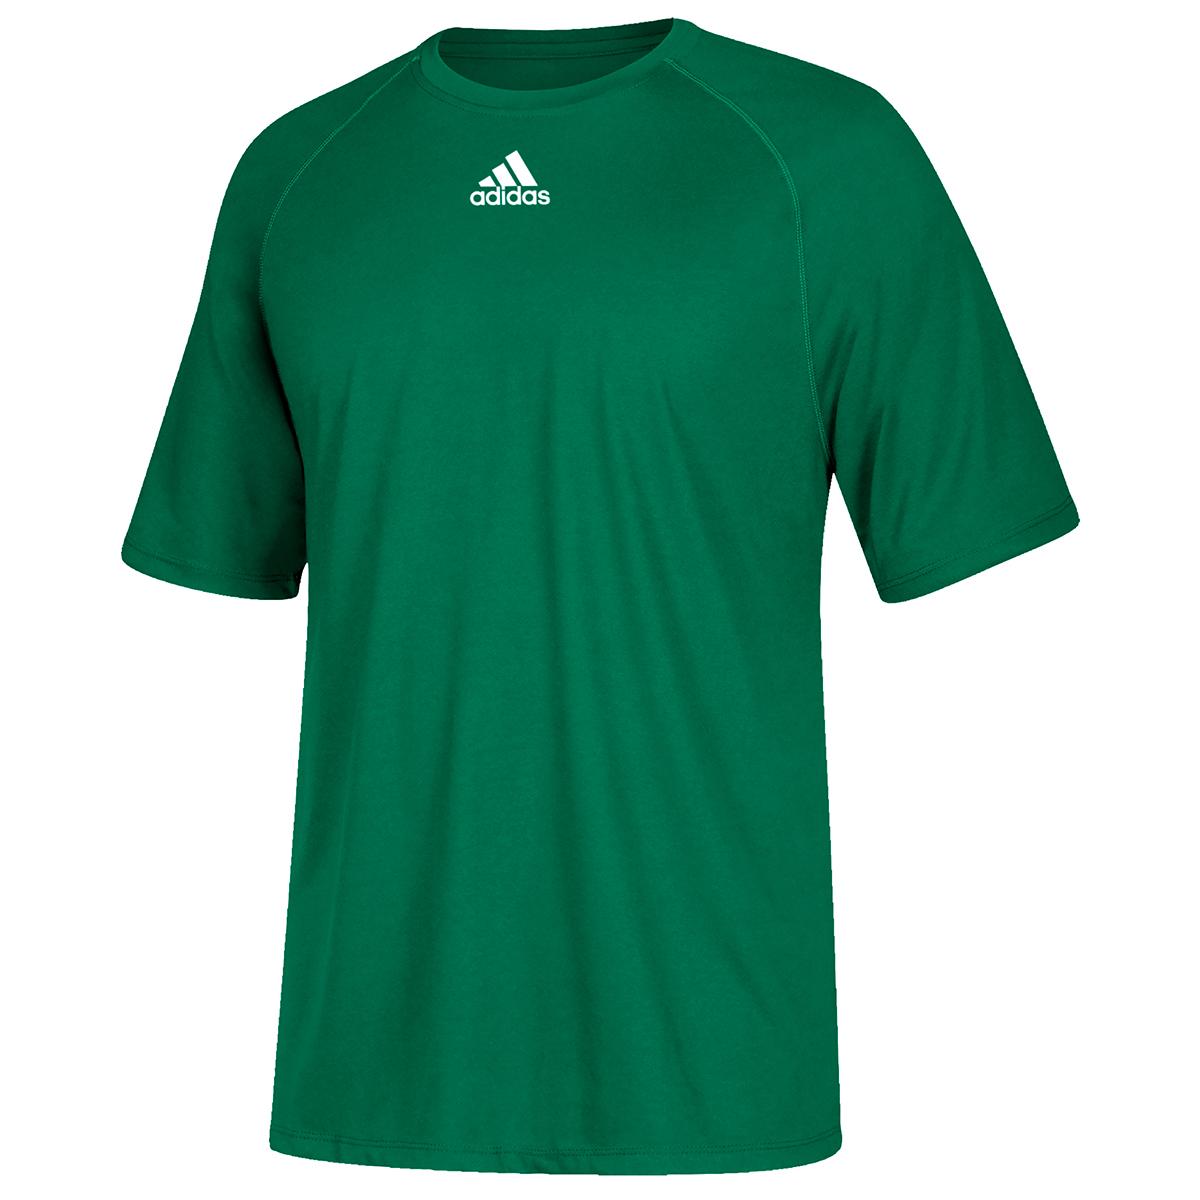 Adidas Men's Climalite Short-Sleeve Tee - Green, S